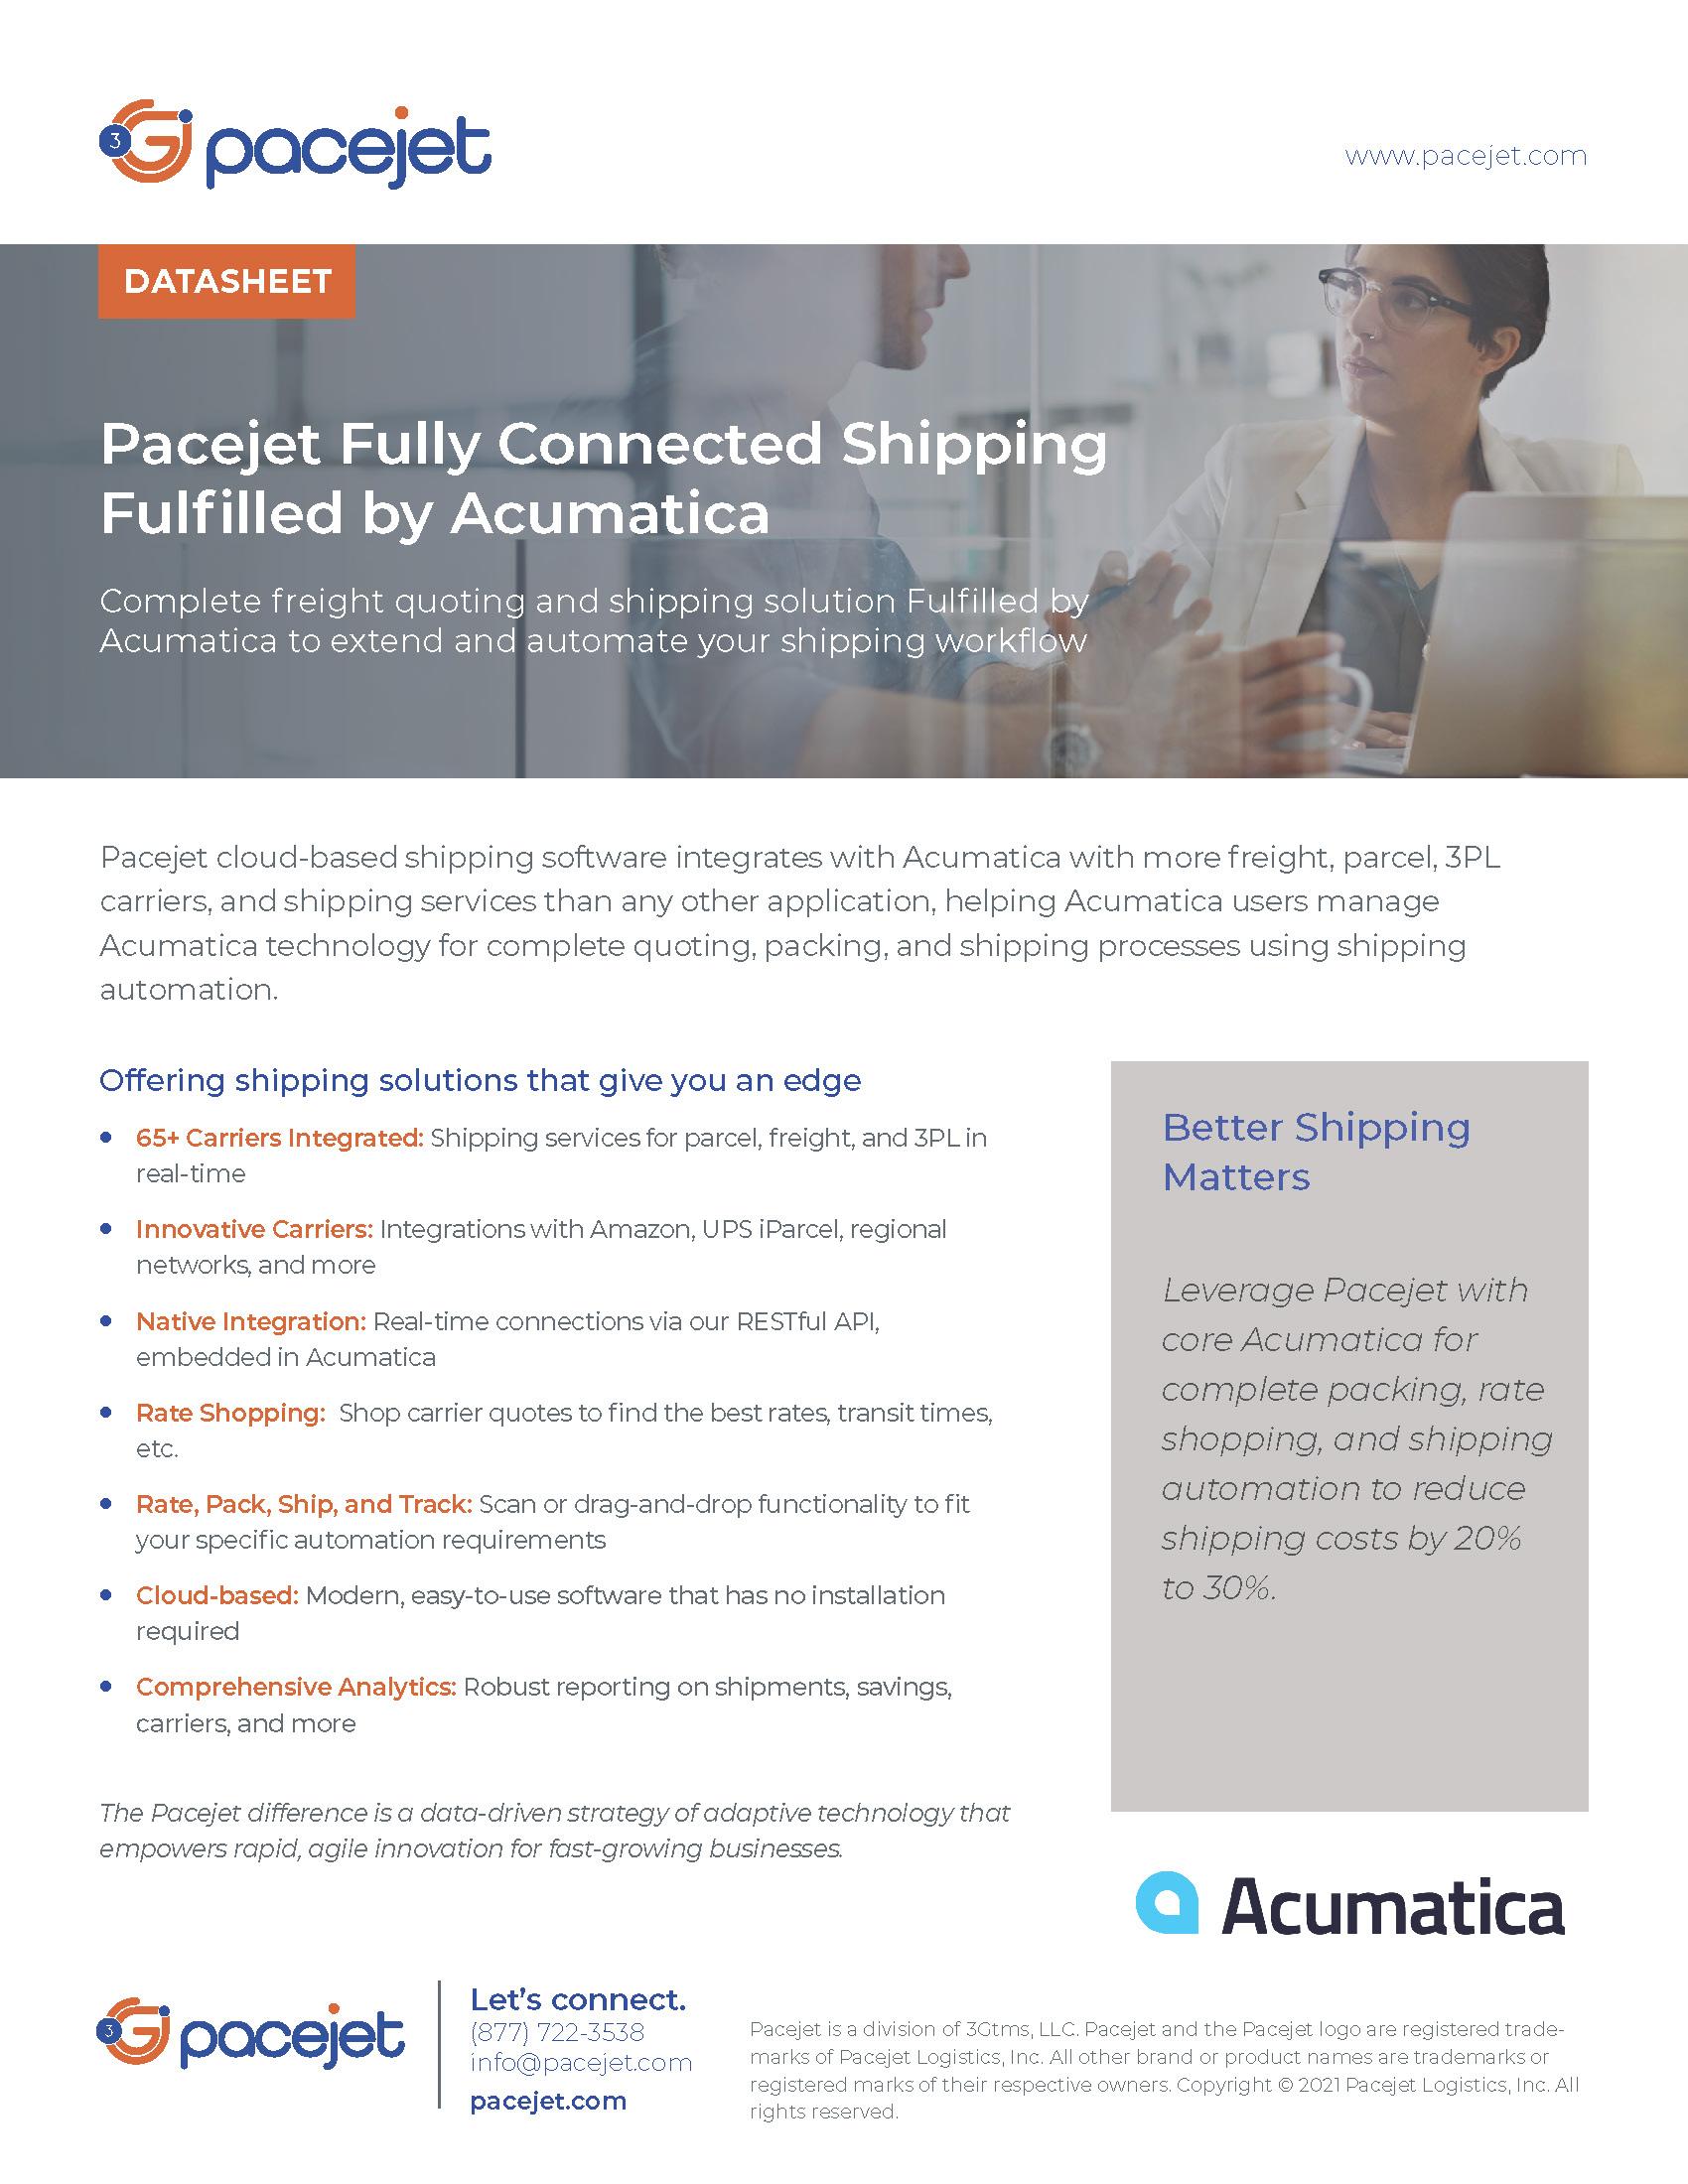 Pacejet_Acumatica_datasheet